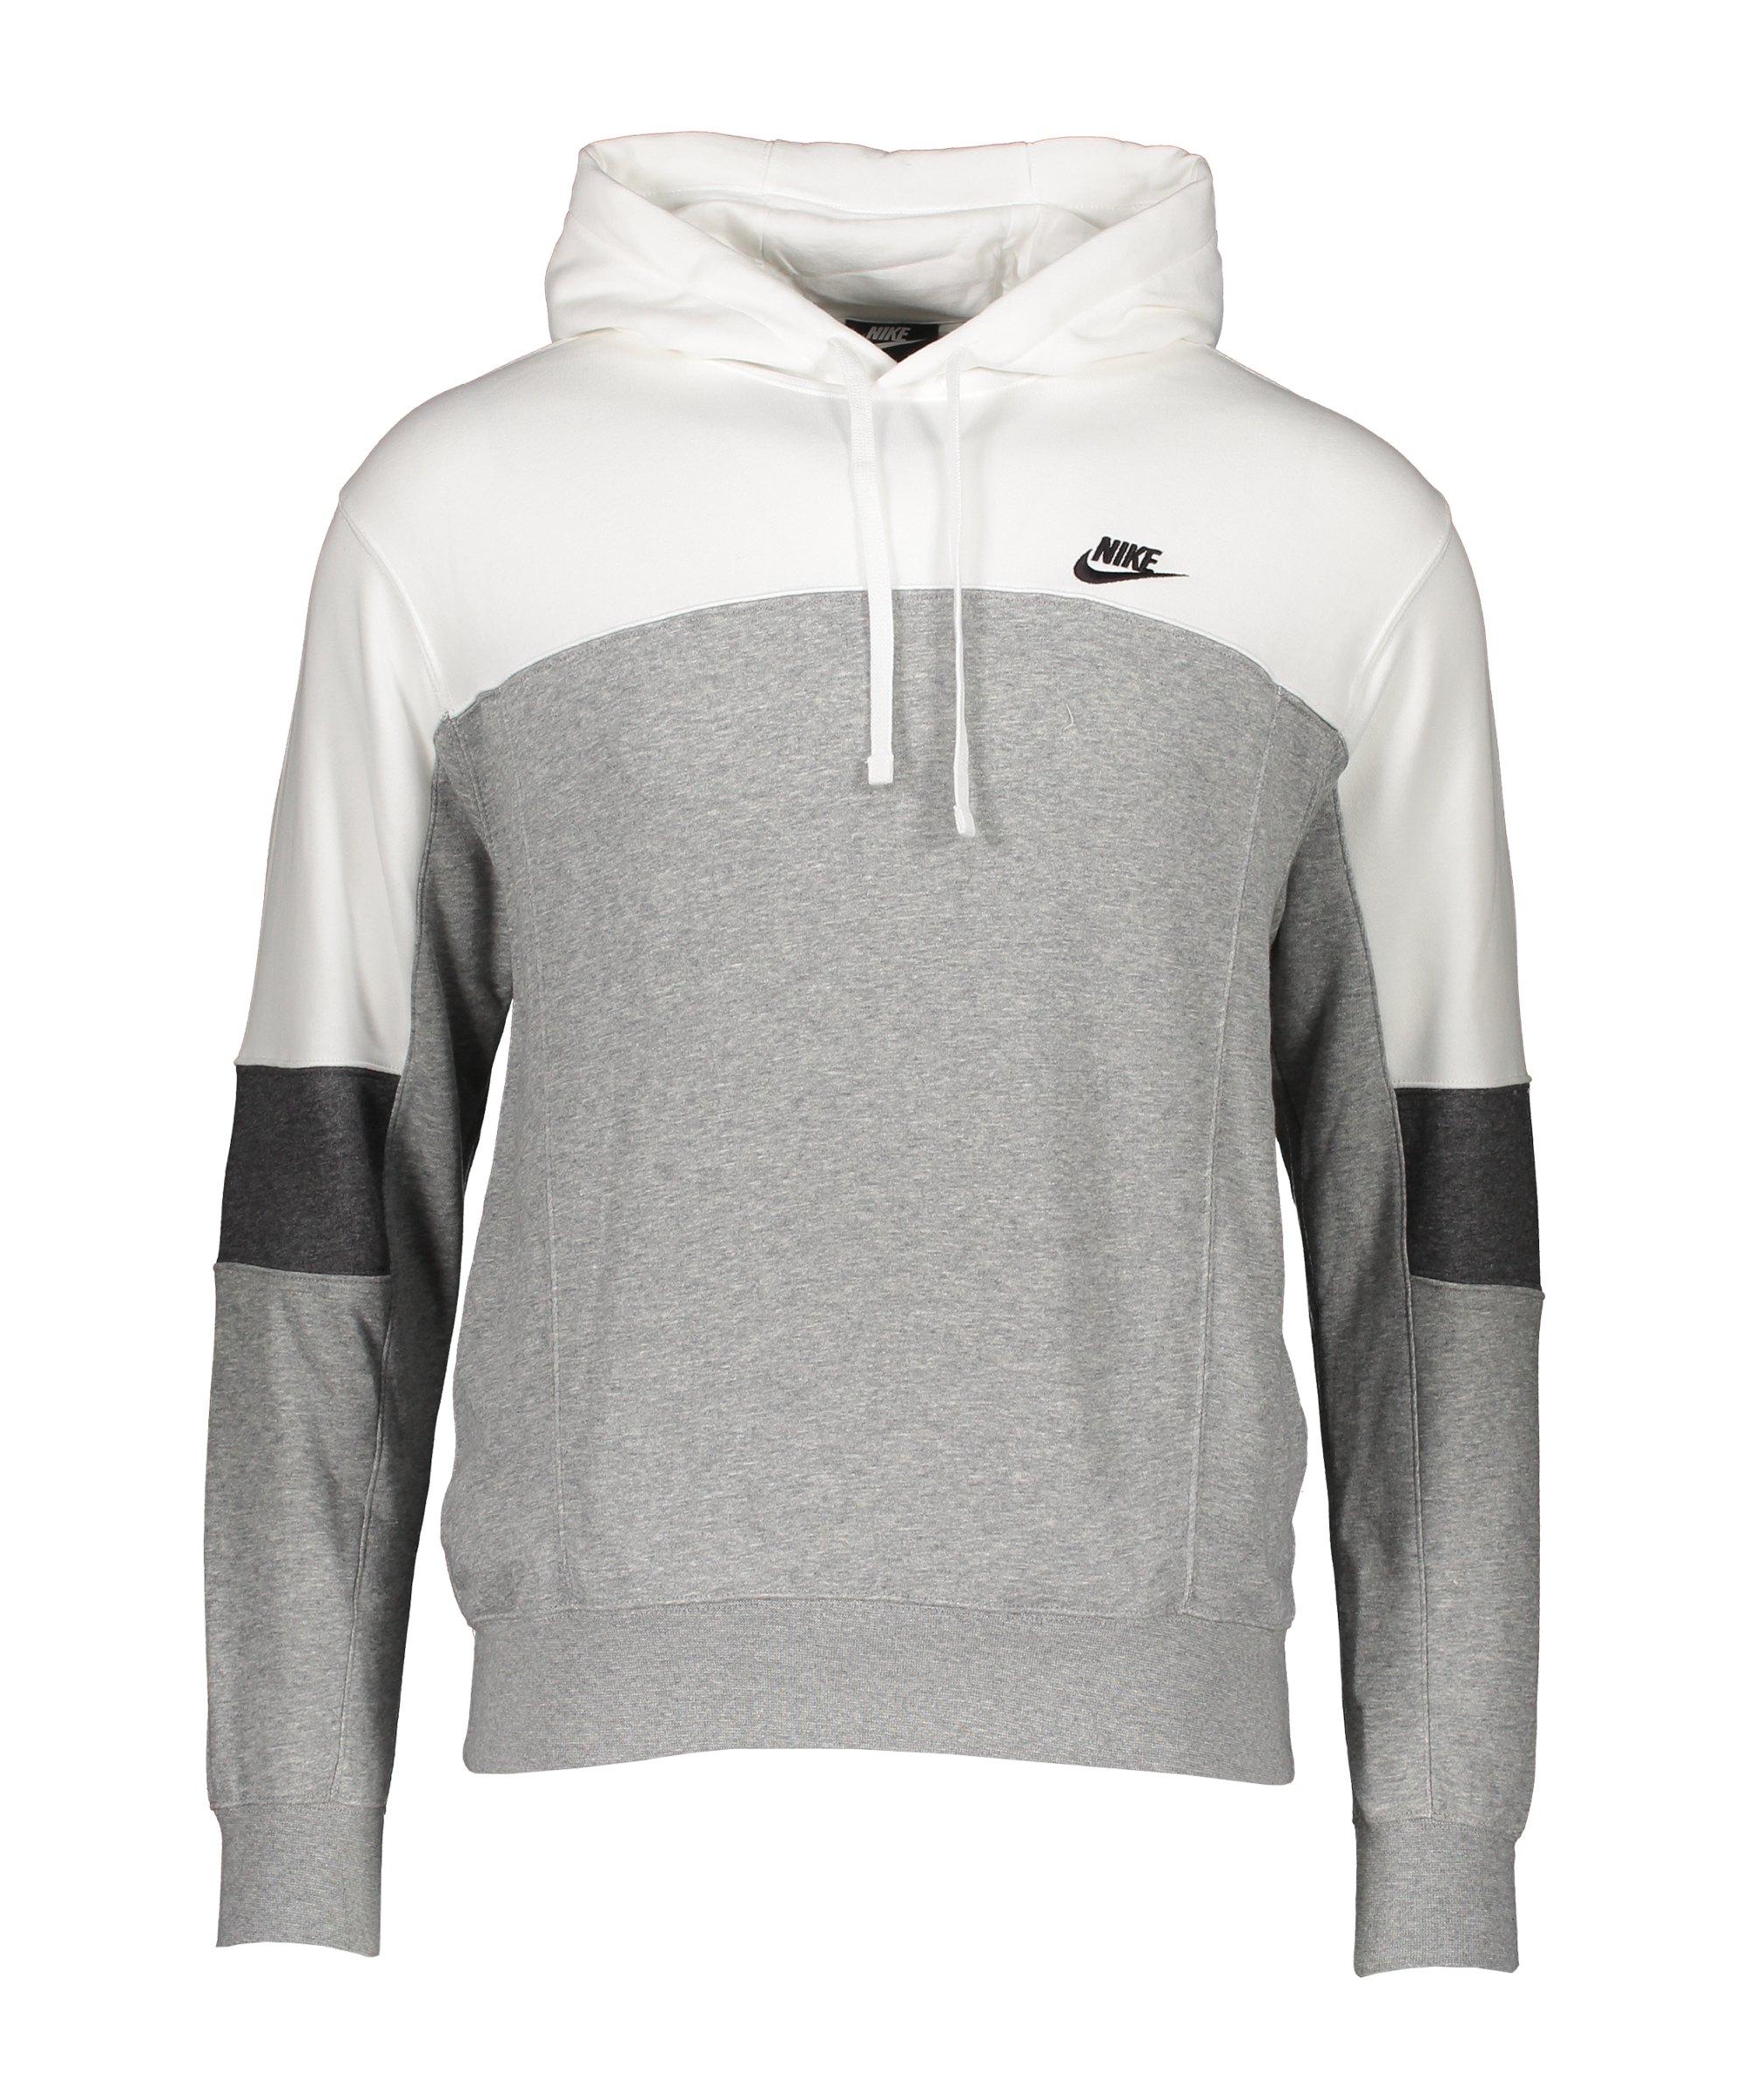 Nike Colorblock Hoody Weiss Grau F100 - weiss